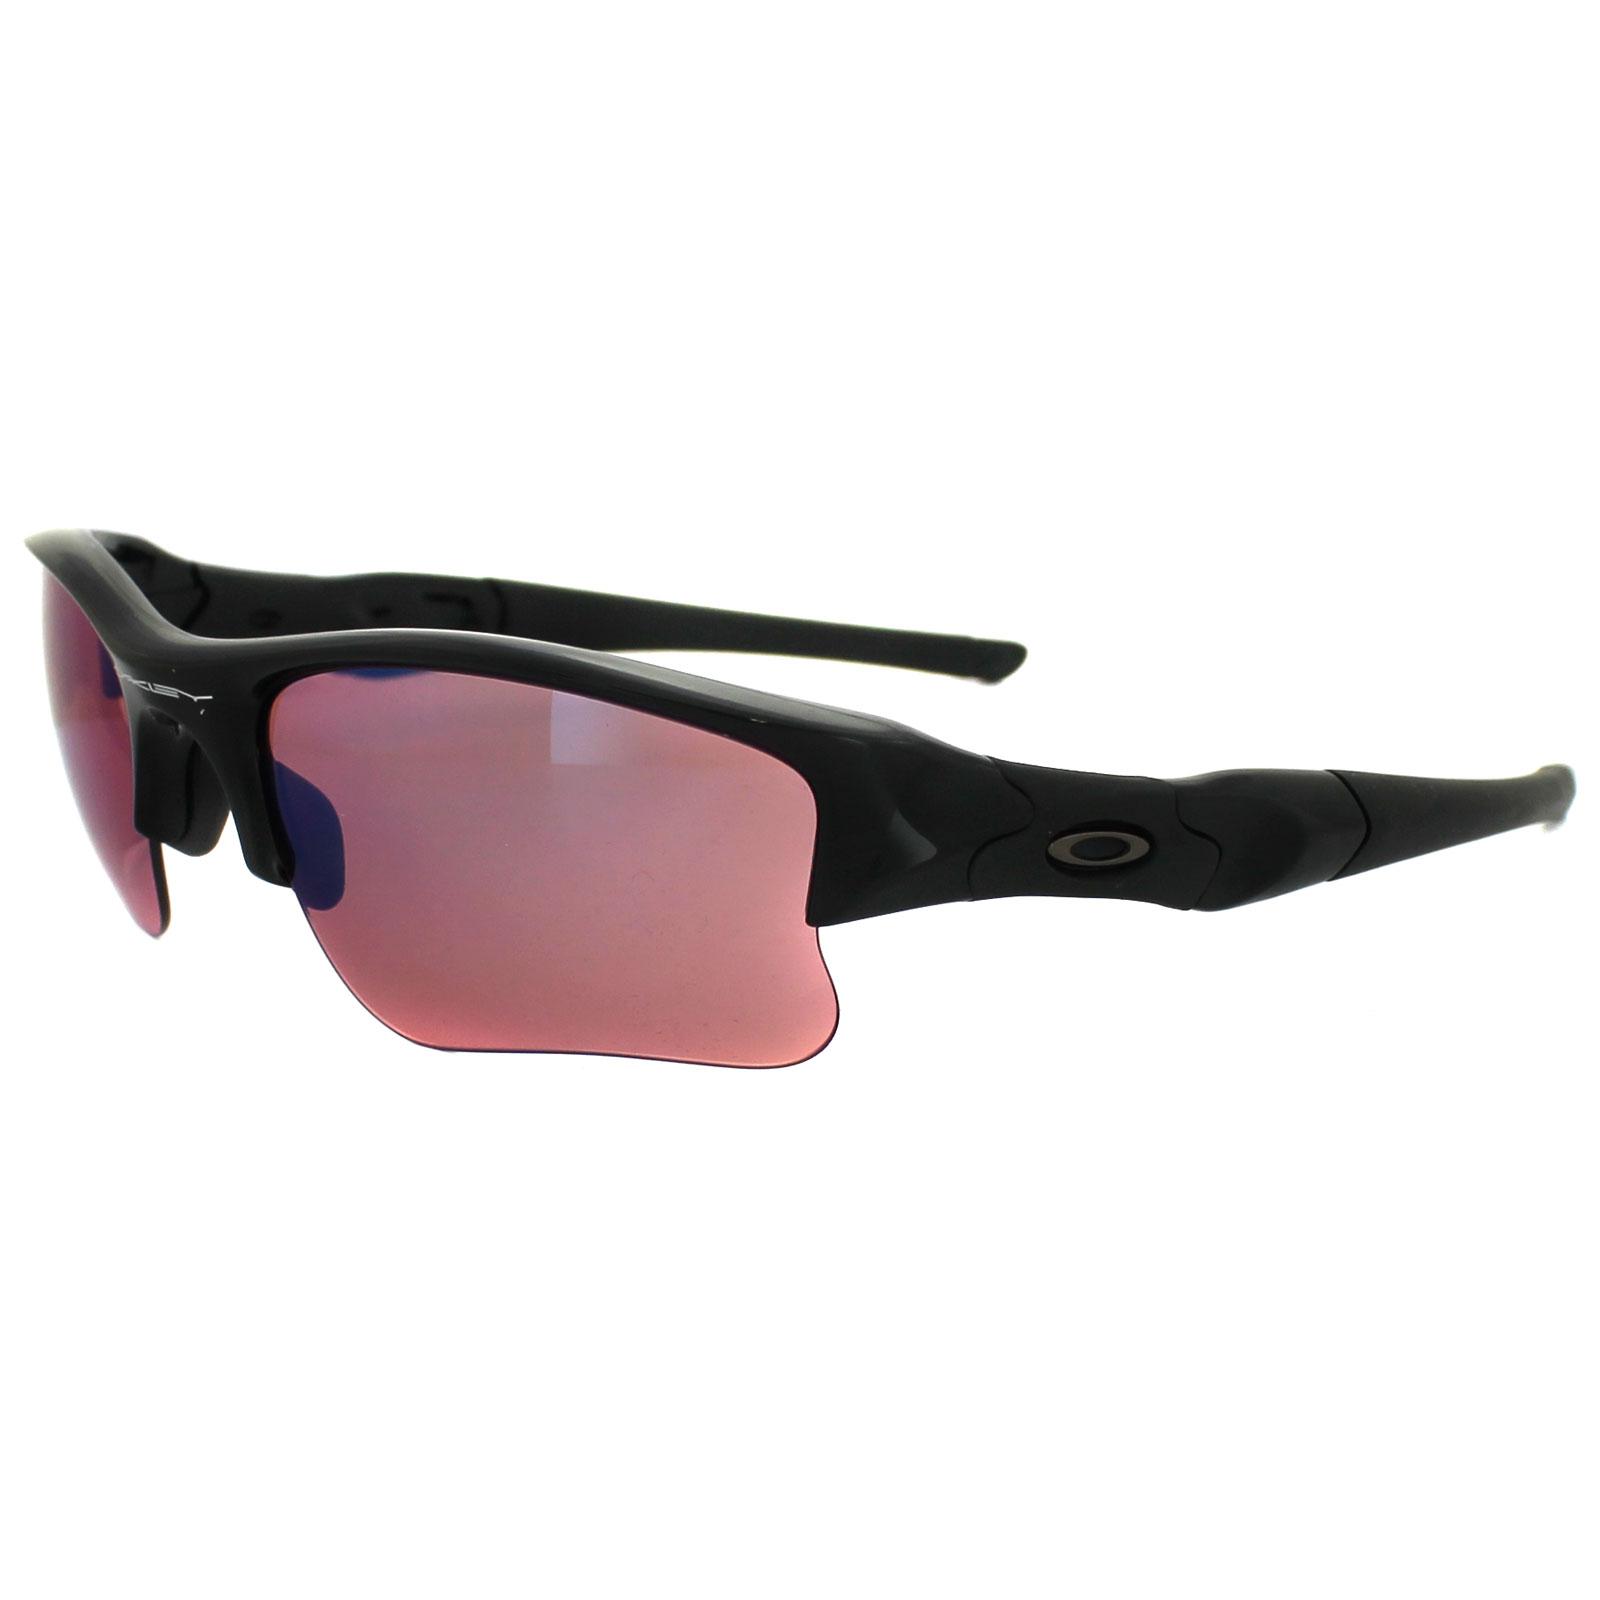 largest oakley sunglasses